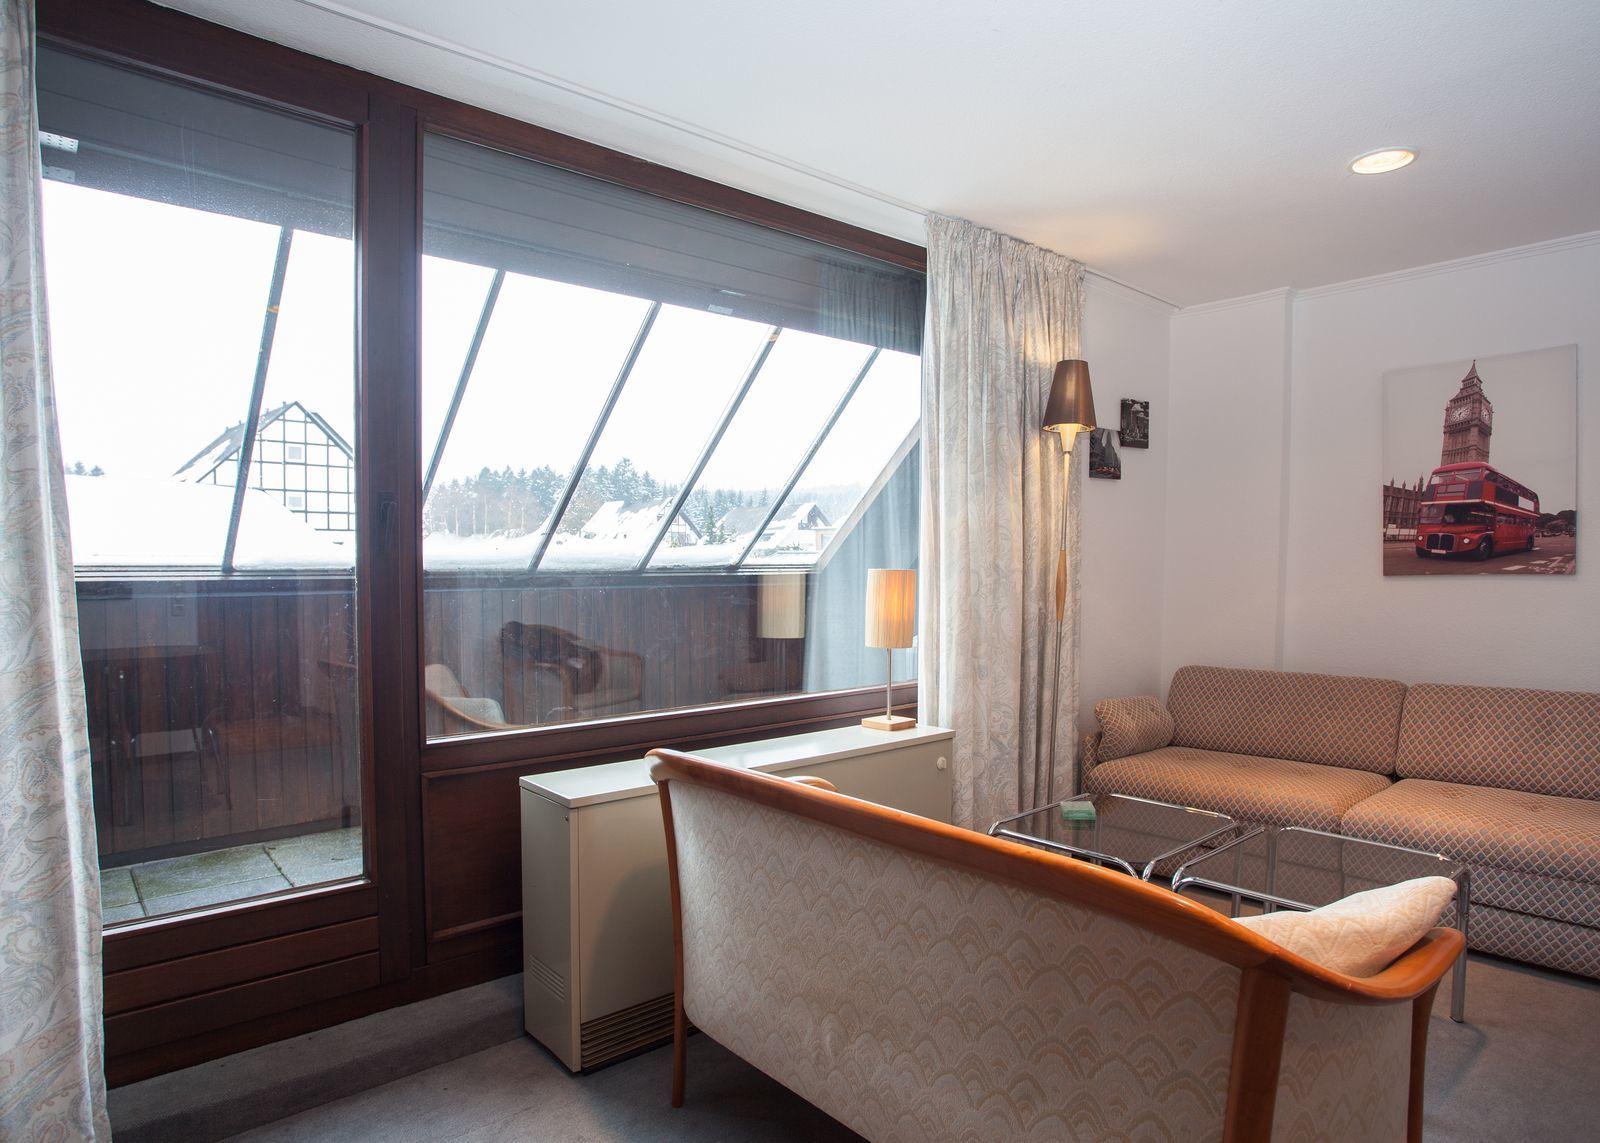 Apartement - Dr. Sürenstrasse 13-10 | Winterberg